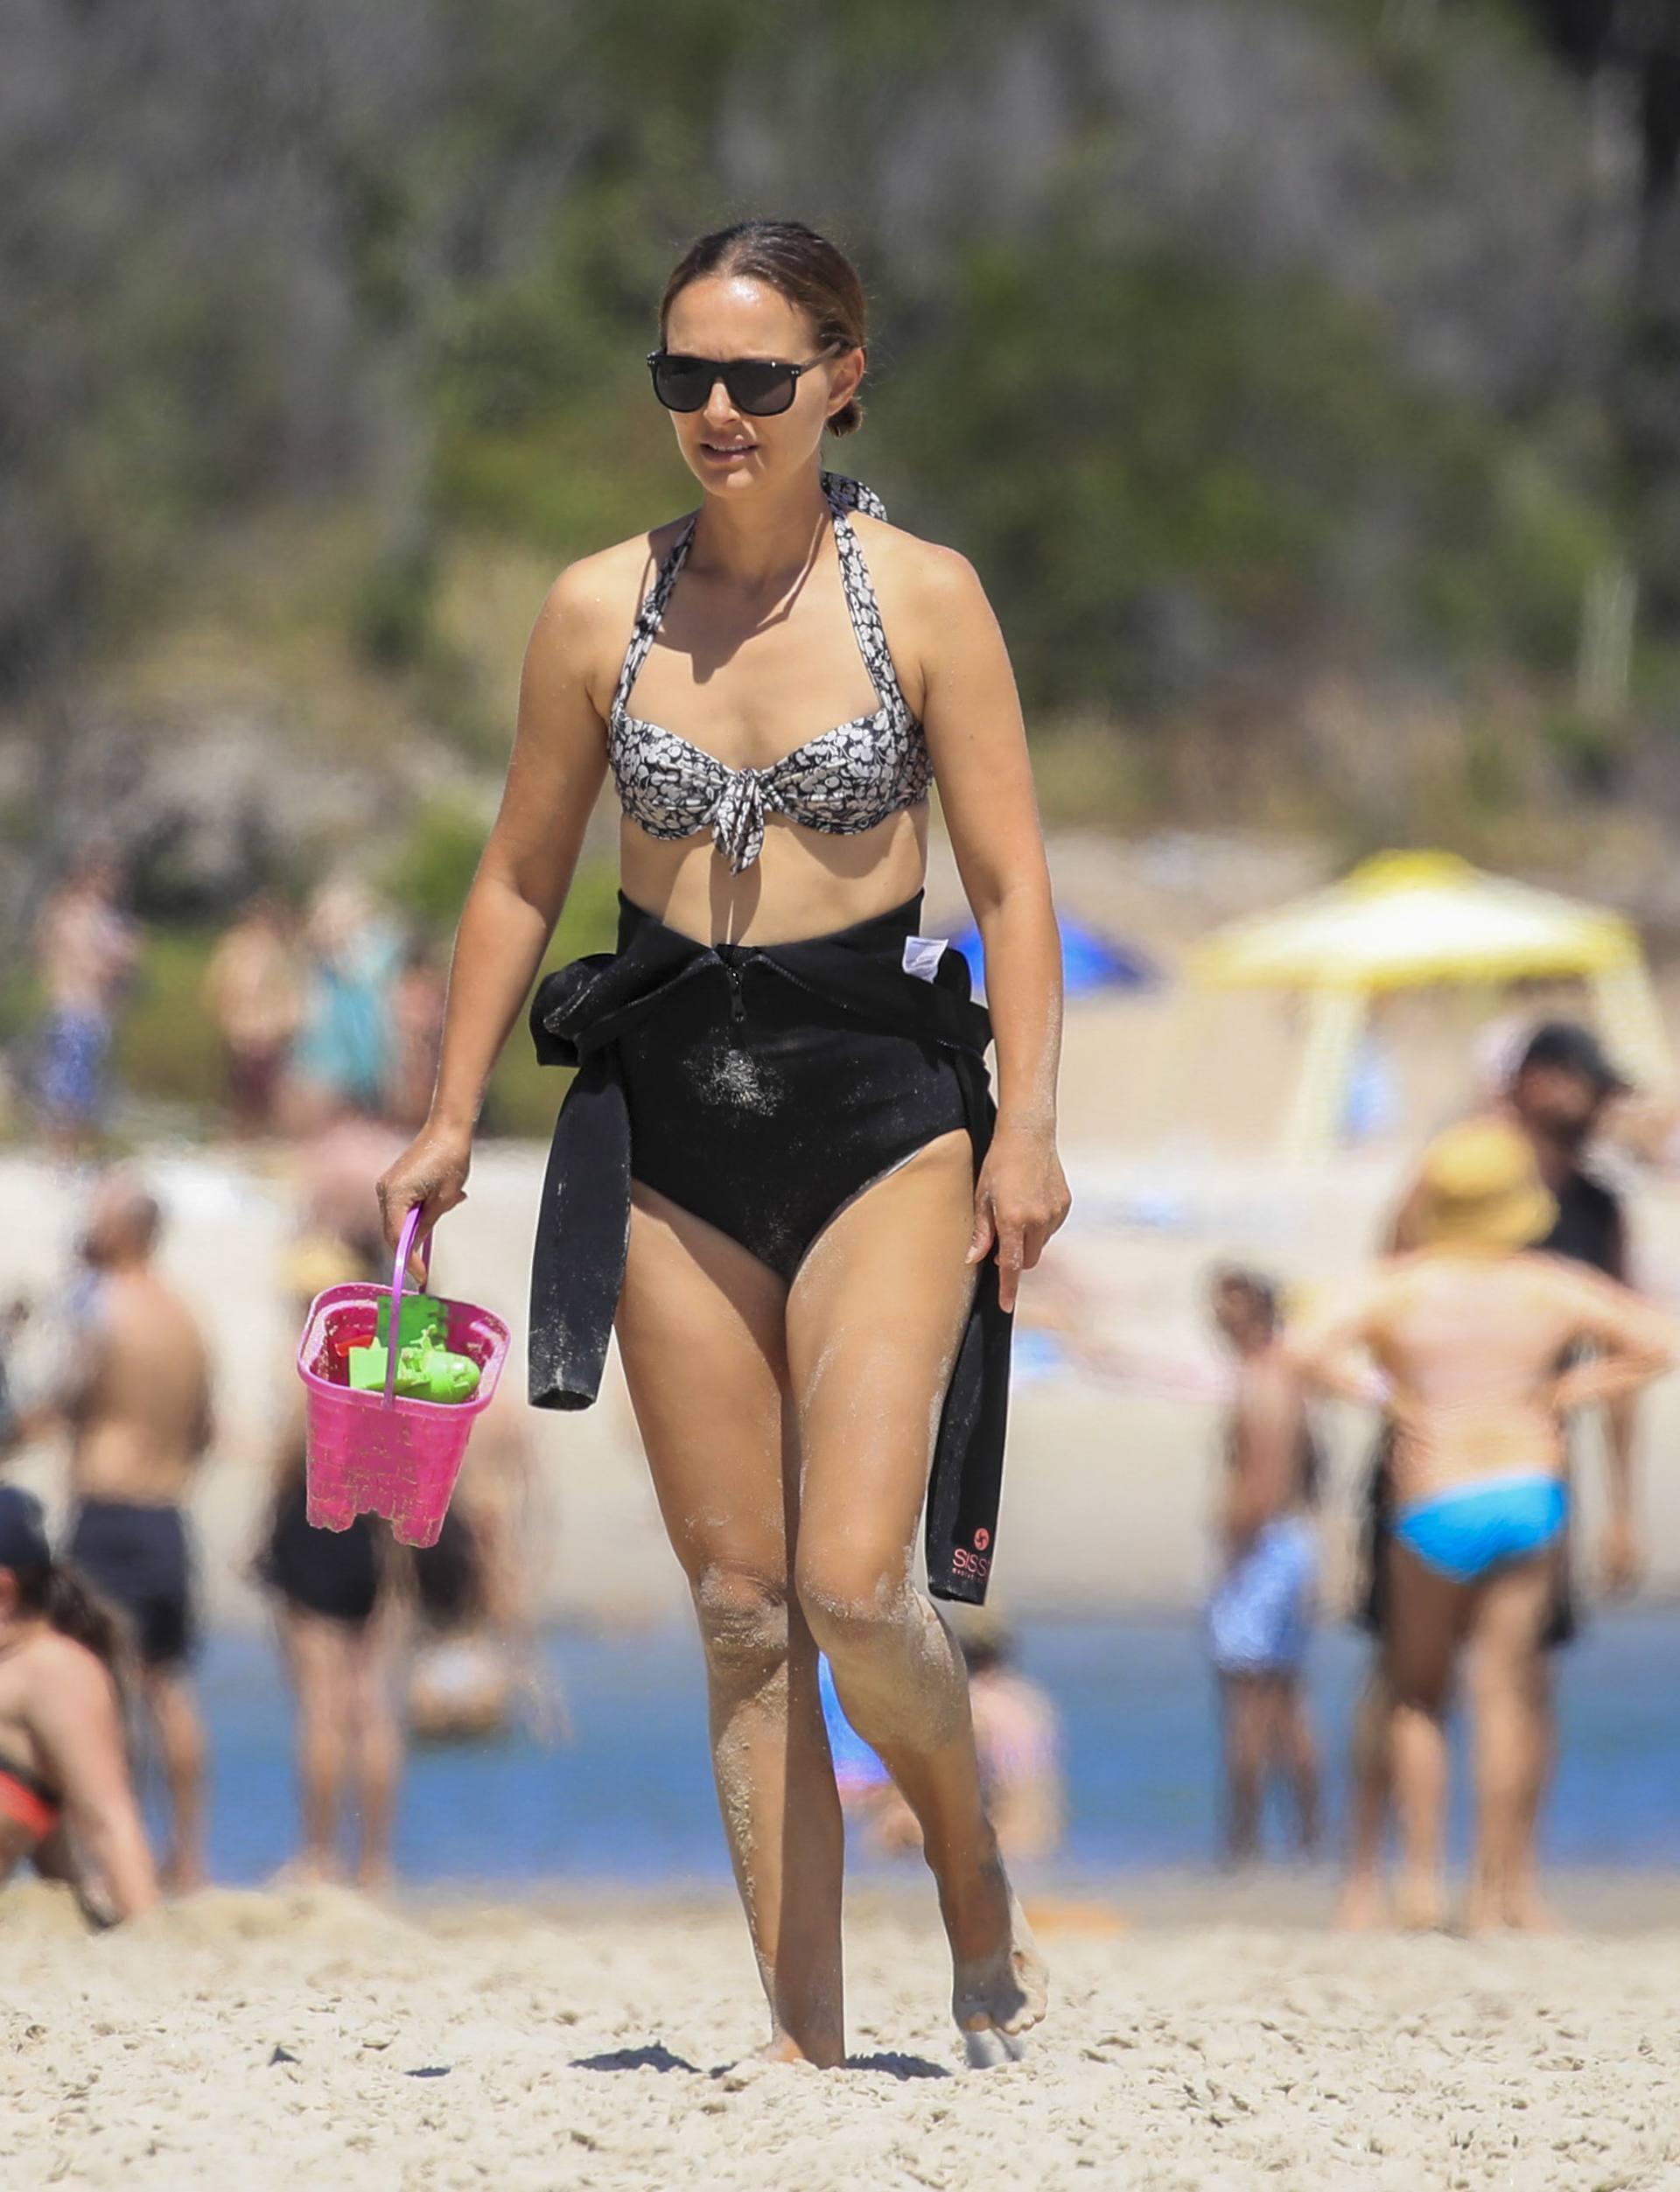 Natalie Portman In Bikini